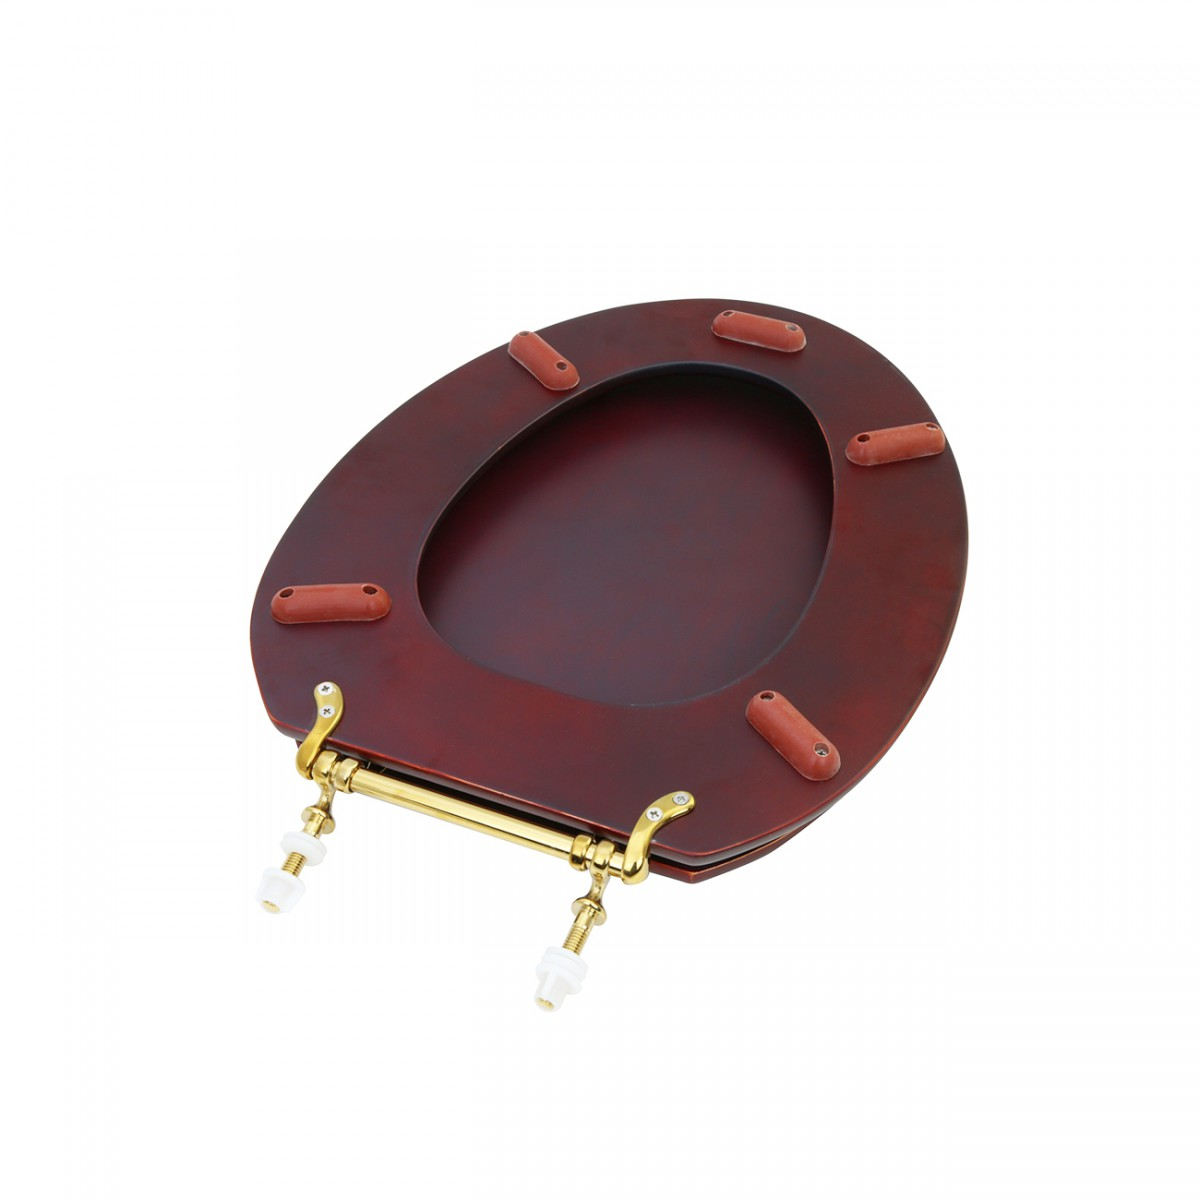 Toilet Seat Elongated Solid Wood Cherry Fin Brass Hinge | Renovators Sup wood toilet seats Cherry wood toilet seat wooden toilet seat